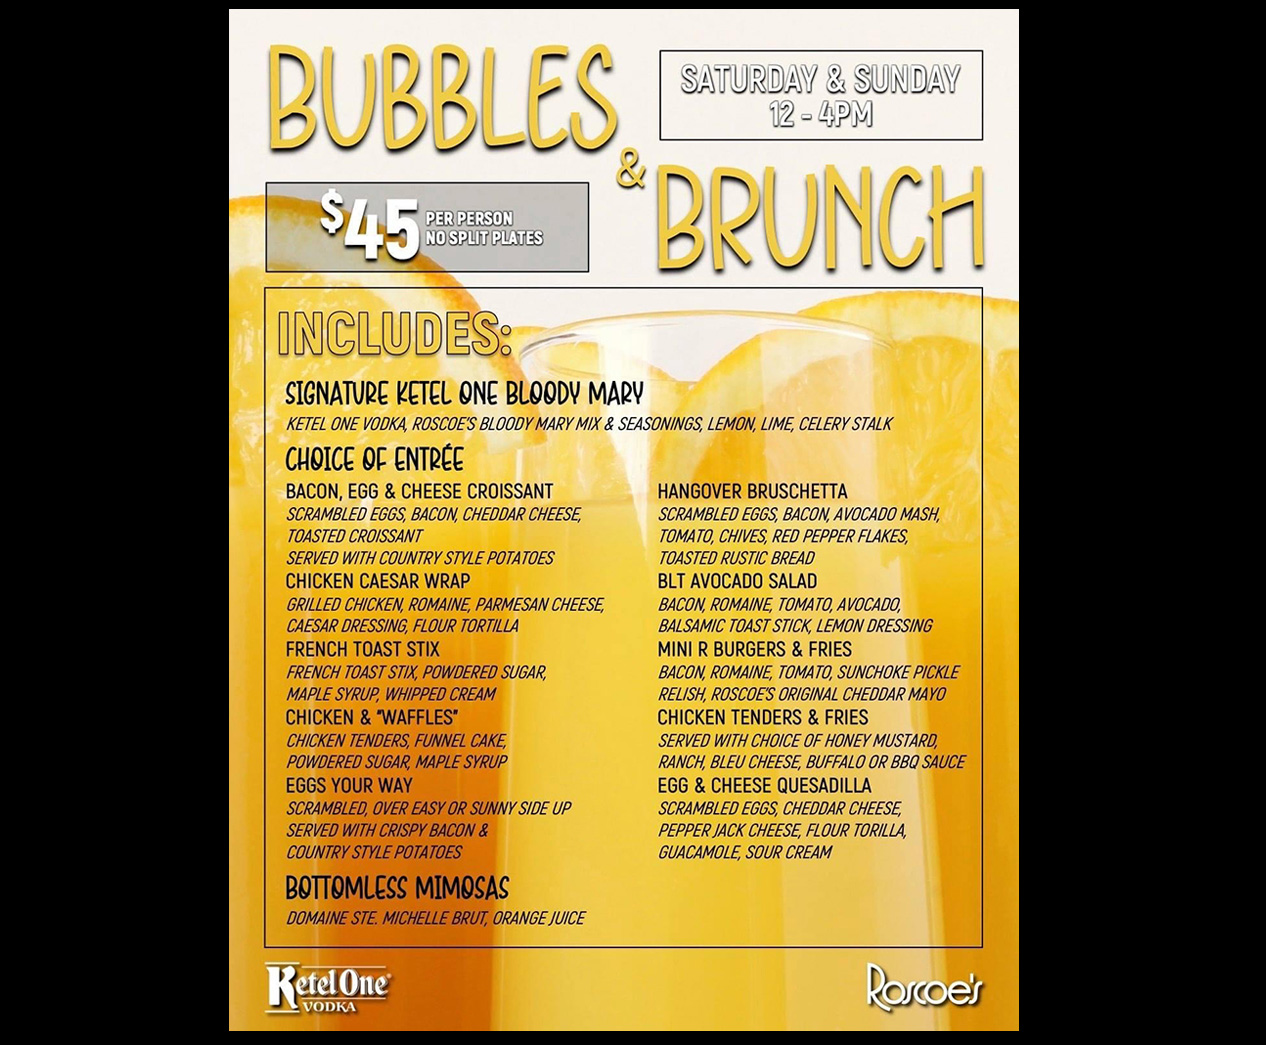 roscoes-brunch-bubbles-thumbnail2